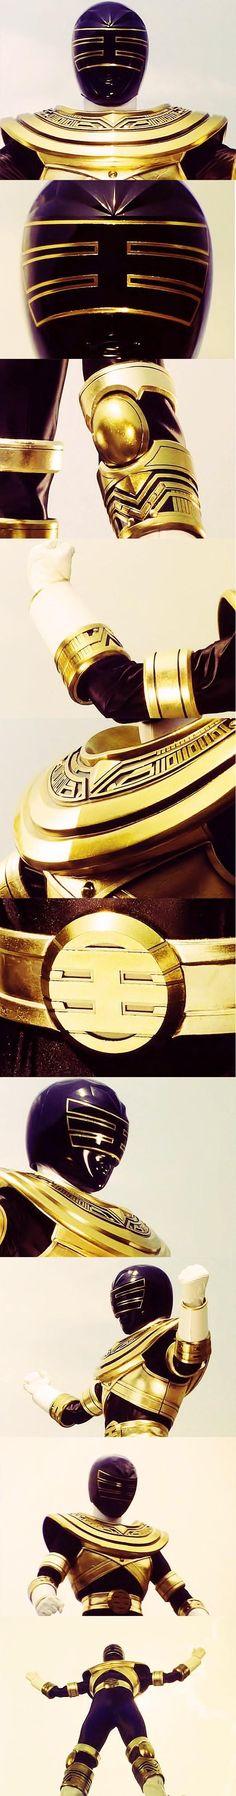 Jason Scott of Earth, The Gold Zeo Ranger Trey of Triforia, The Original Gold Zeo Ranger